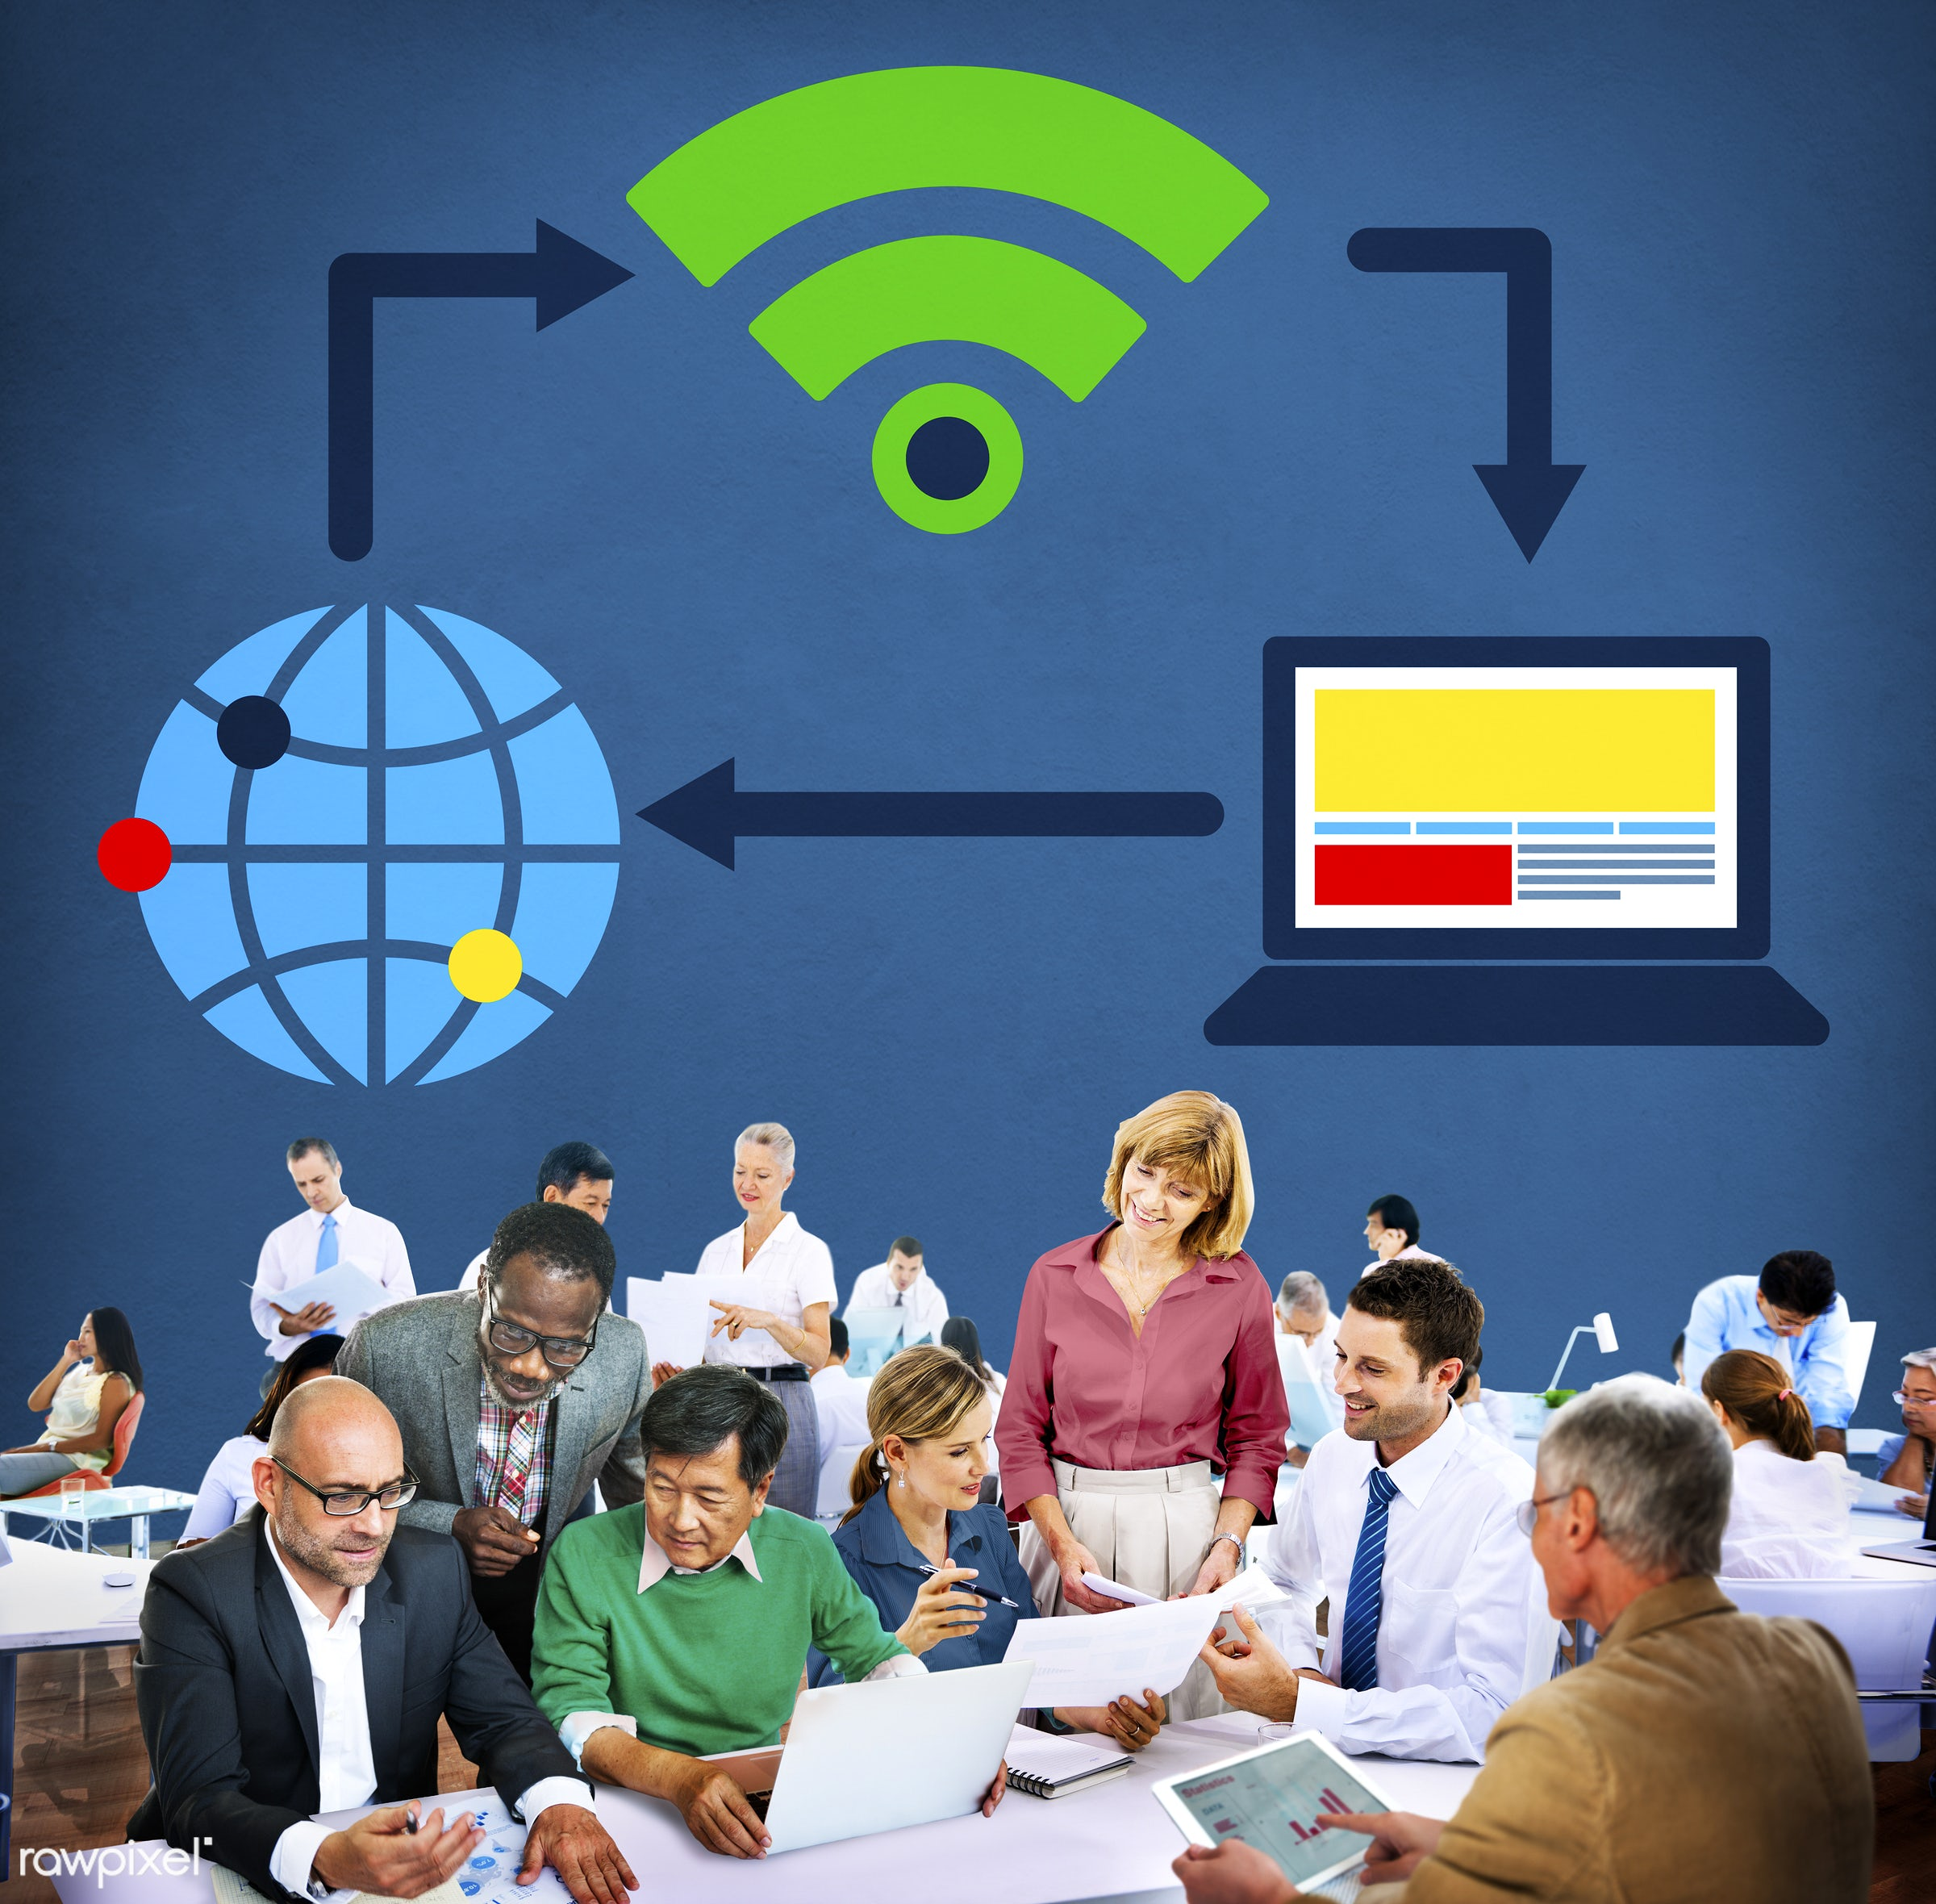 business people, businessmen, businesswomen, communication, community, connection, corporate, creativity, data, diversity,...